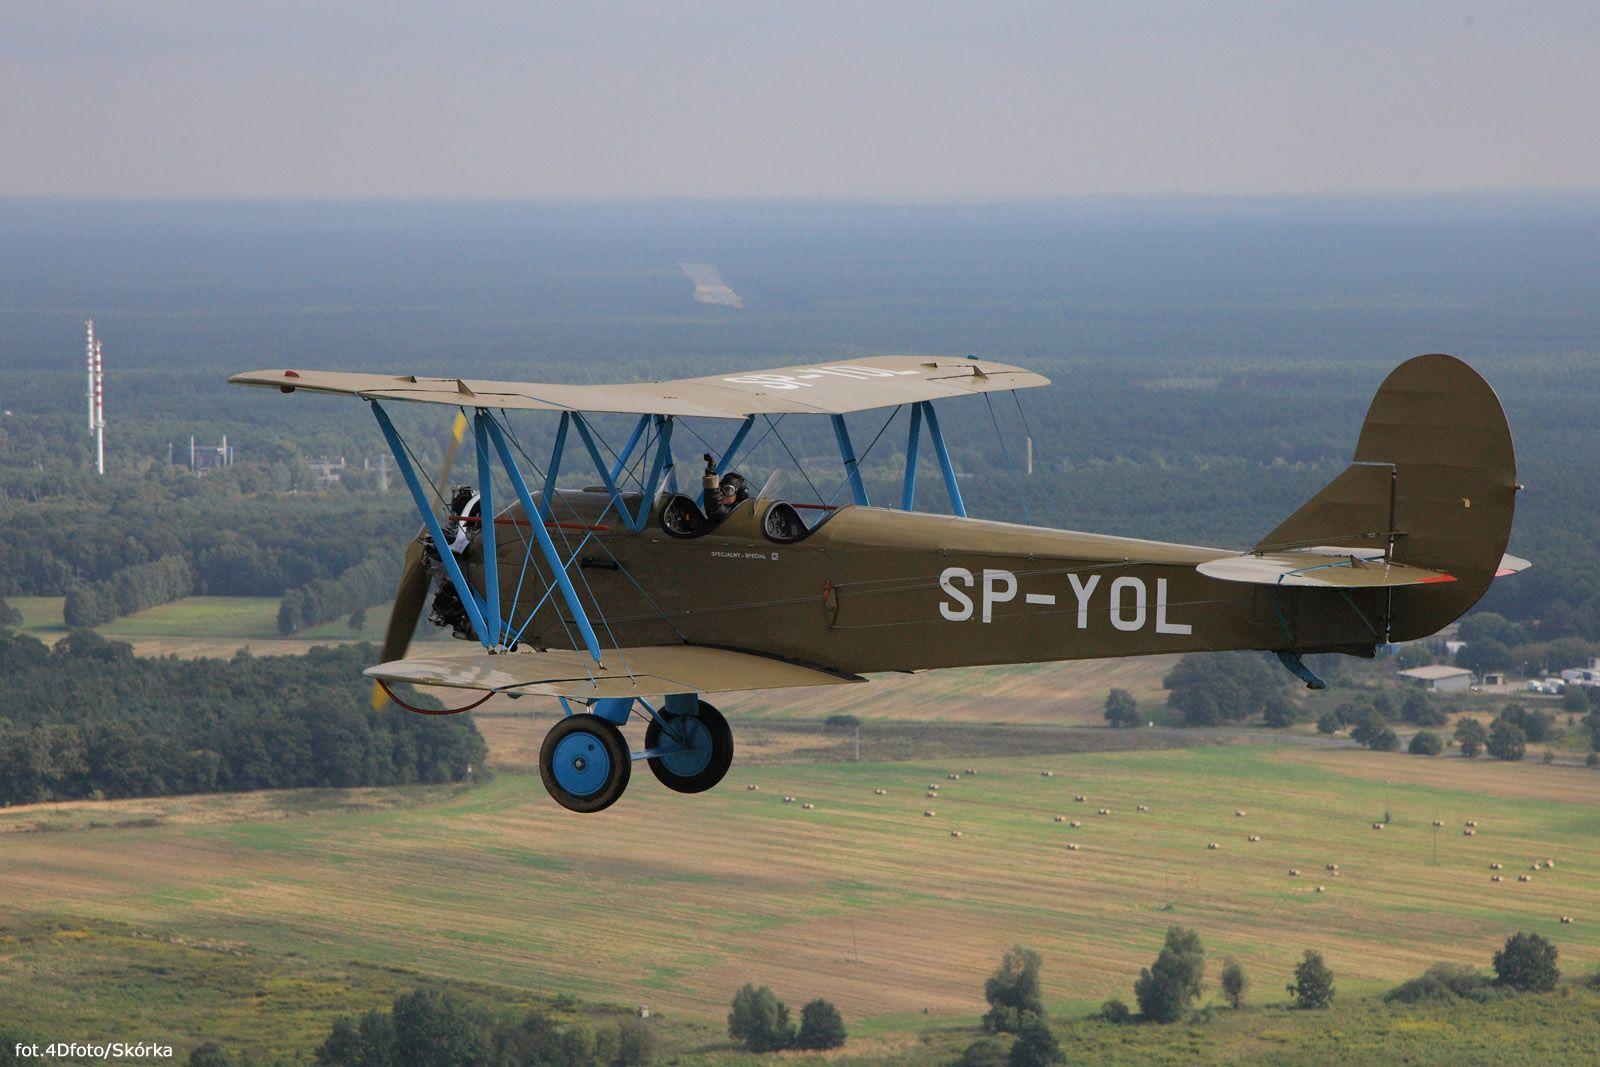 fot. 4Dfoto/Skórka Samolot